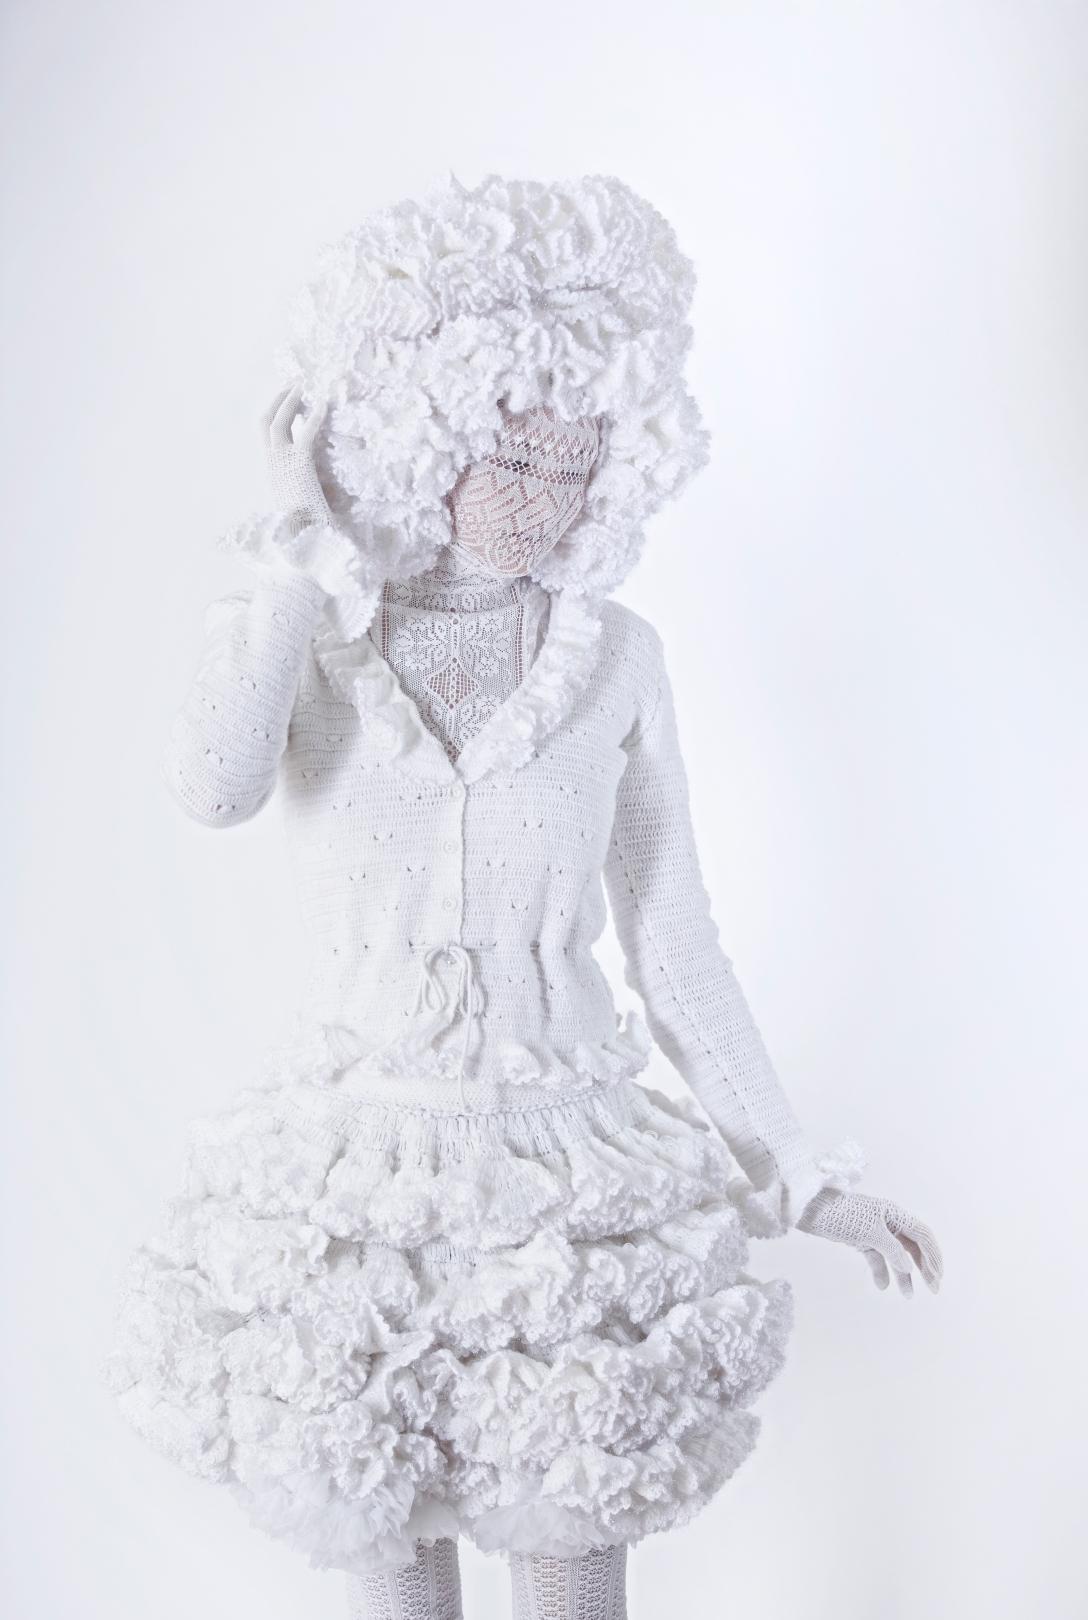 Susanne Bisovsky, Tracht, Trachtenmode, Design, Wien, Outstanding Artist Award 2020,